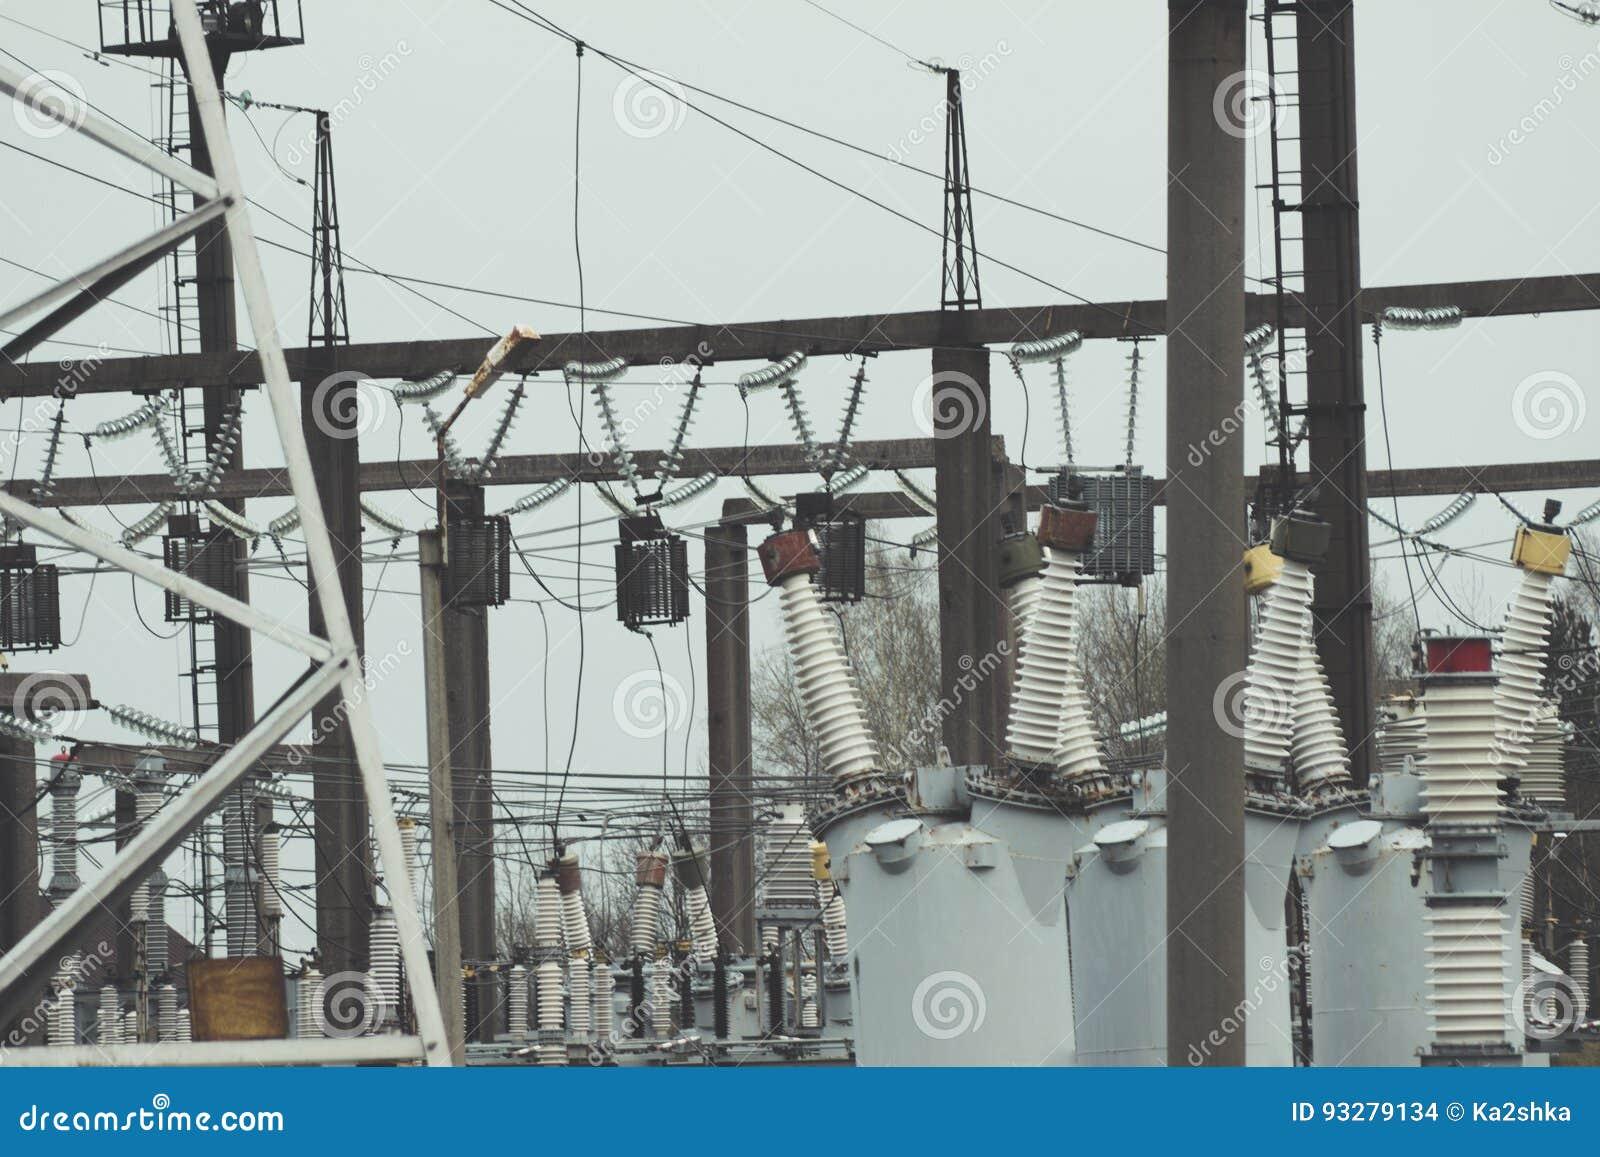 Production building power cables